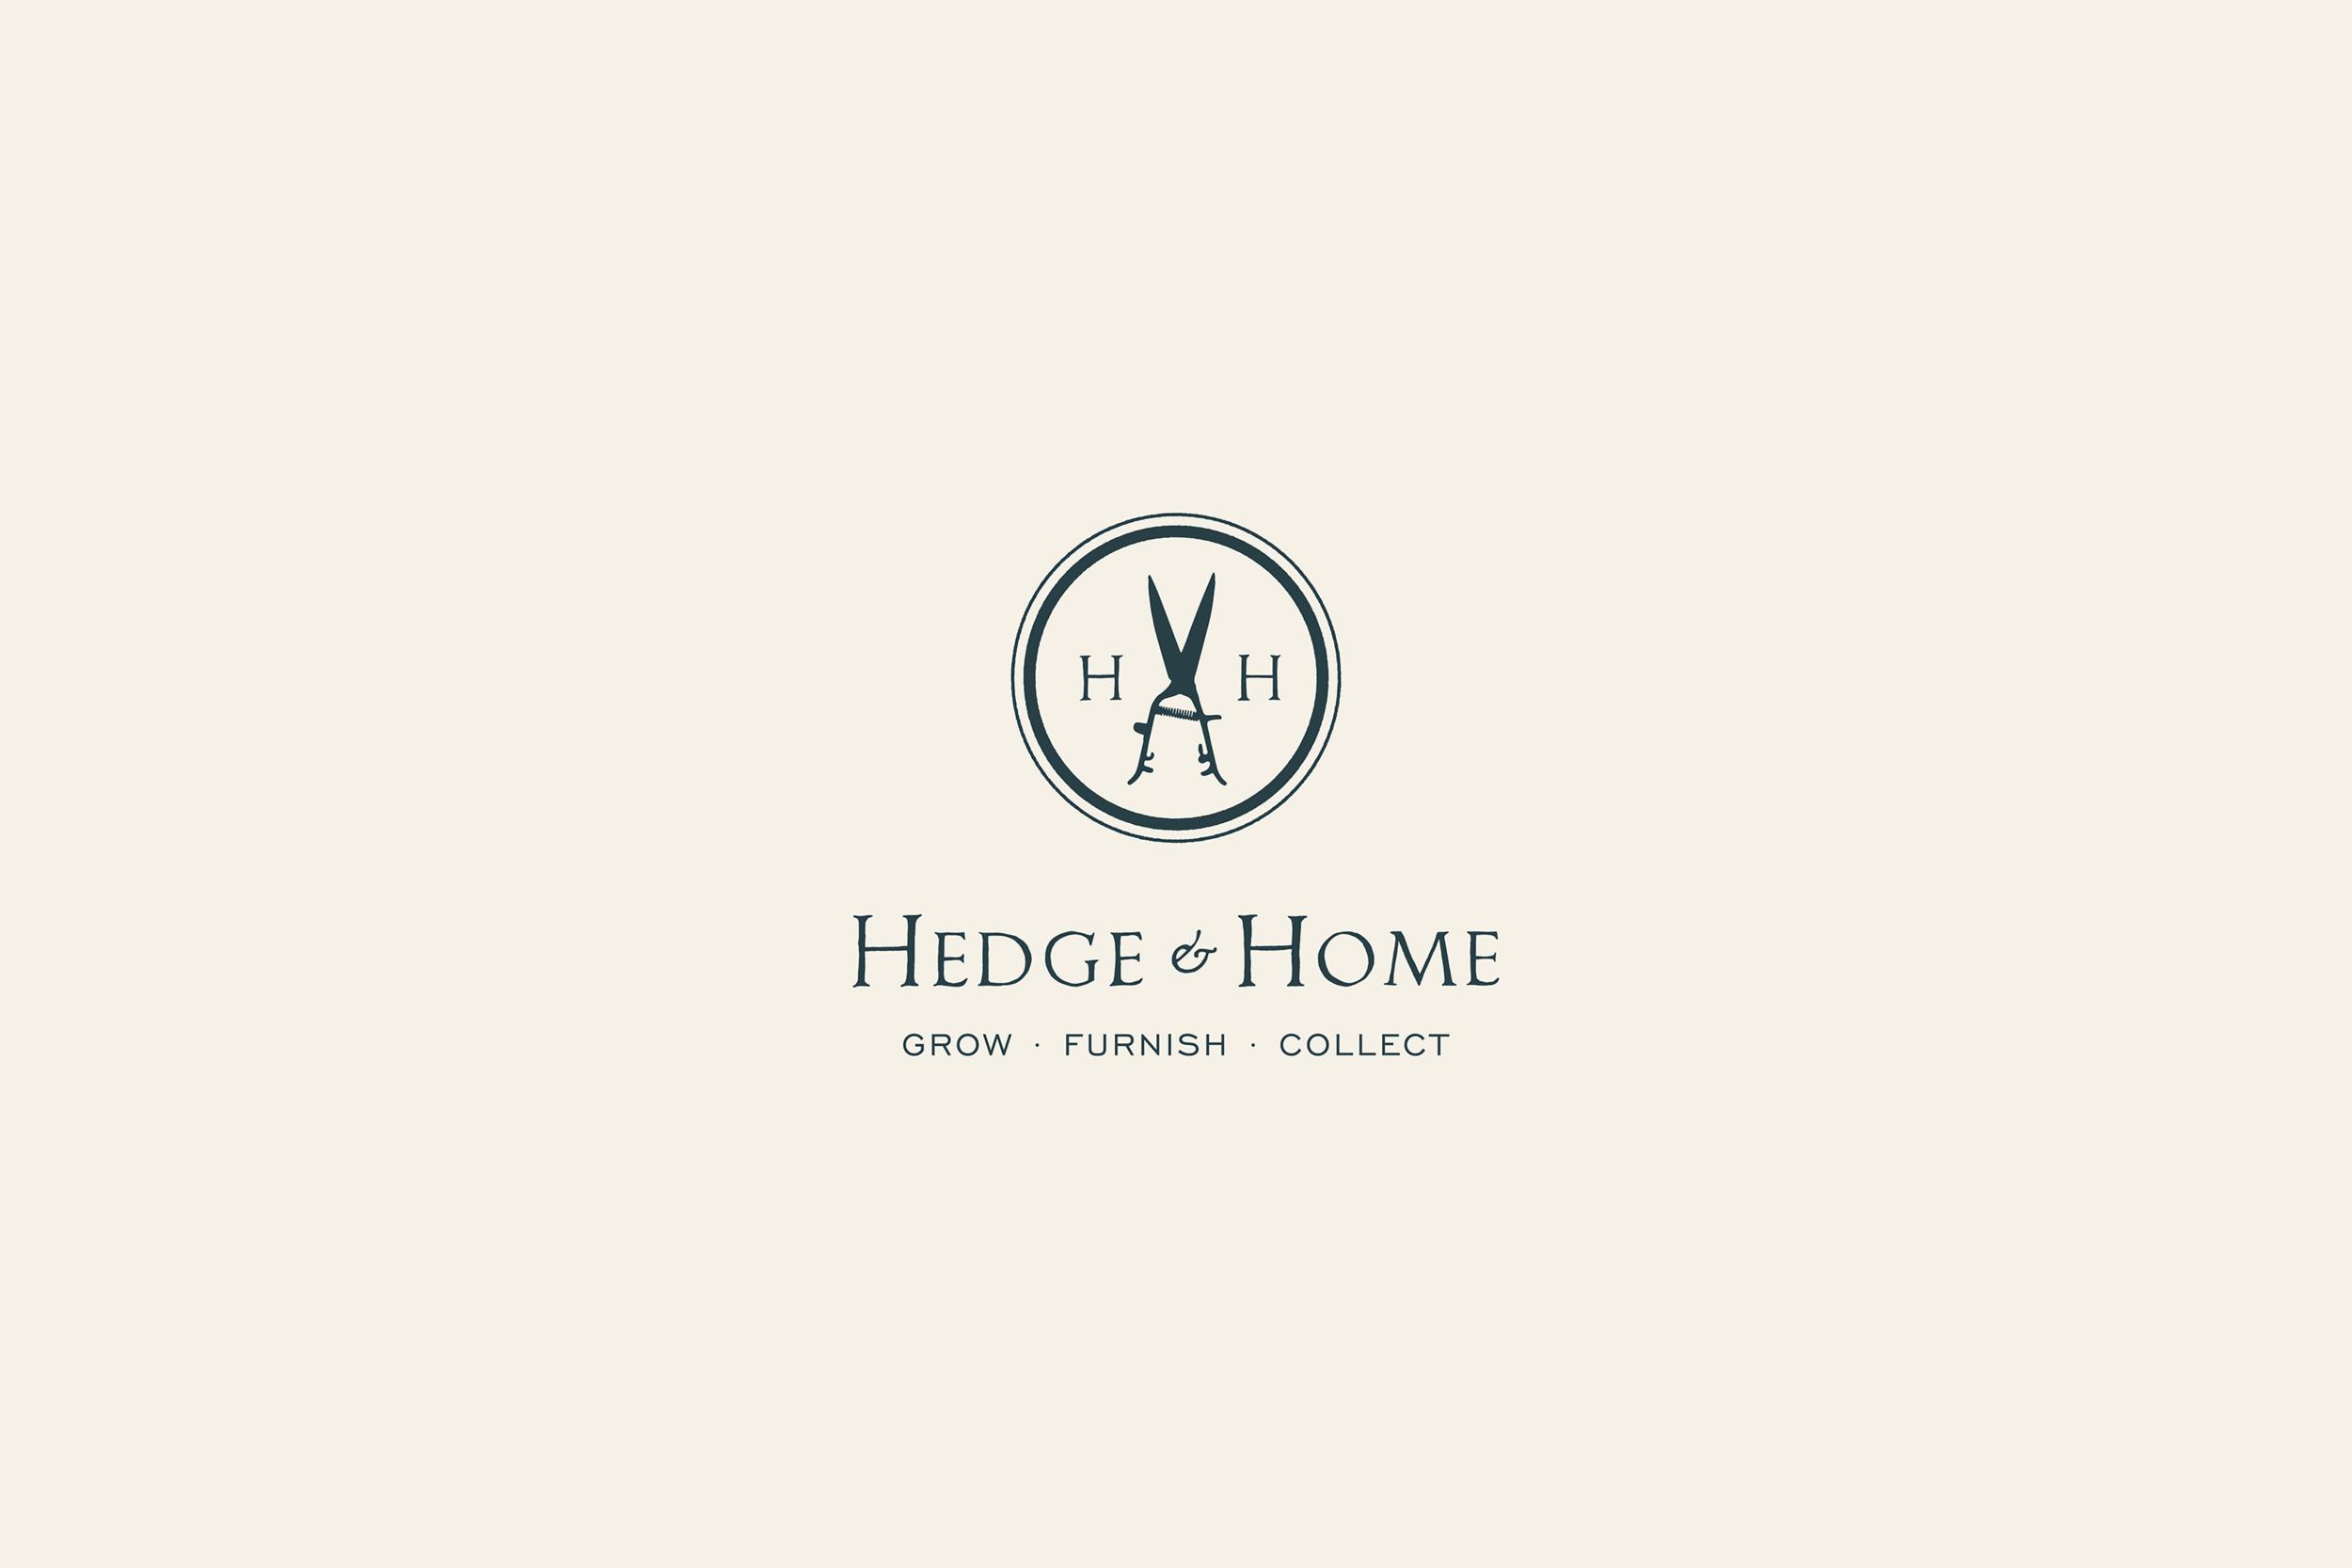 1_Logo-Design_Hedge-and-Home_Rachelle-Sartini-Garner.png